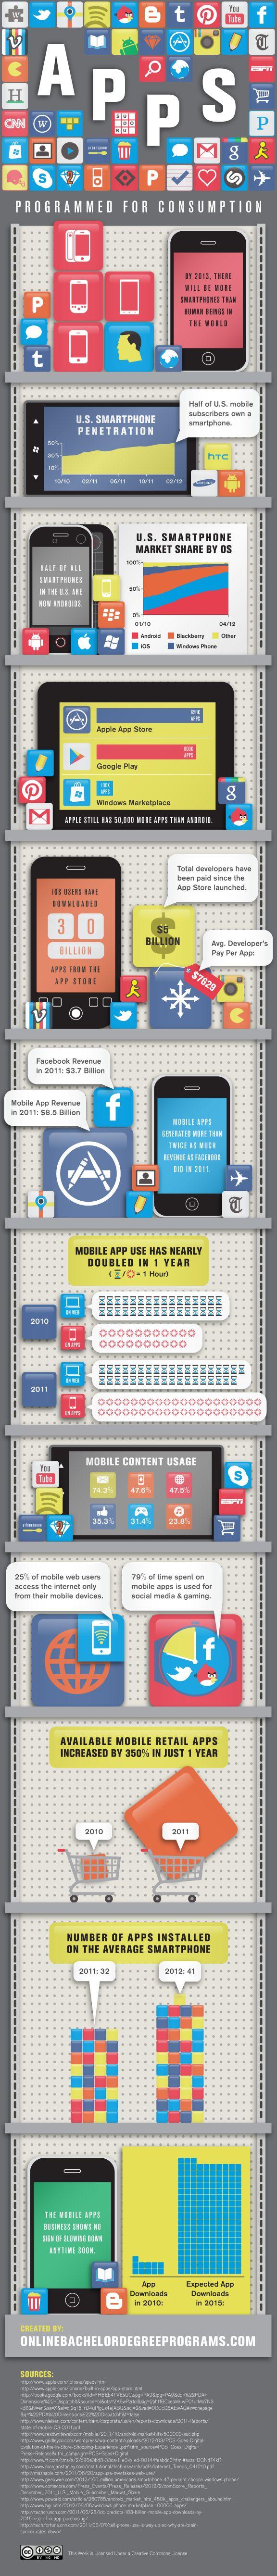 #Apps: Programmed for Consumption #mobile #appdev #infovisApp Business, Gratuita Infografia, Smartphone App, Mobiles Web, Mobiles App, 2012 Infographic, Growing Mobileapps, App Infographic, Mobiles Marketing